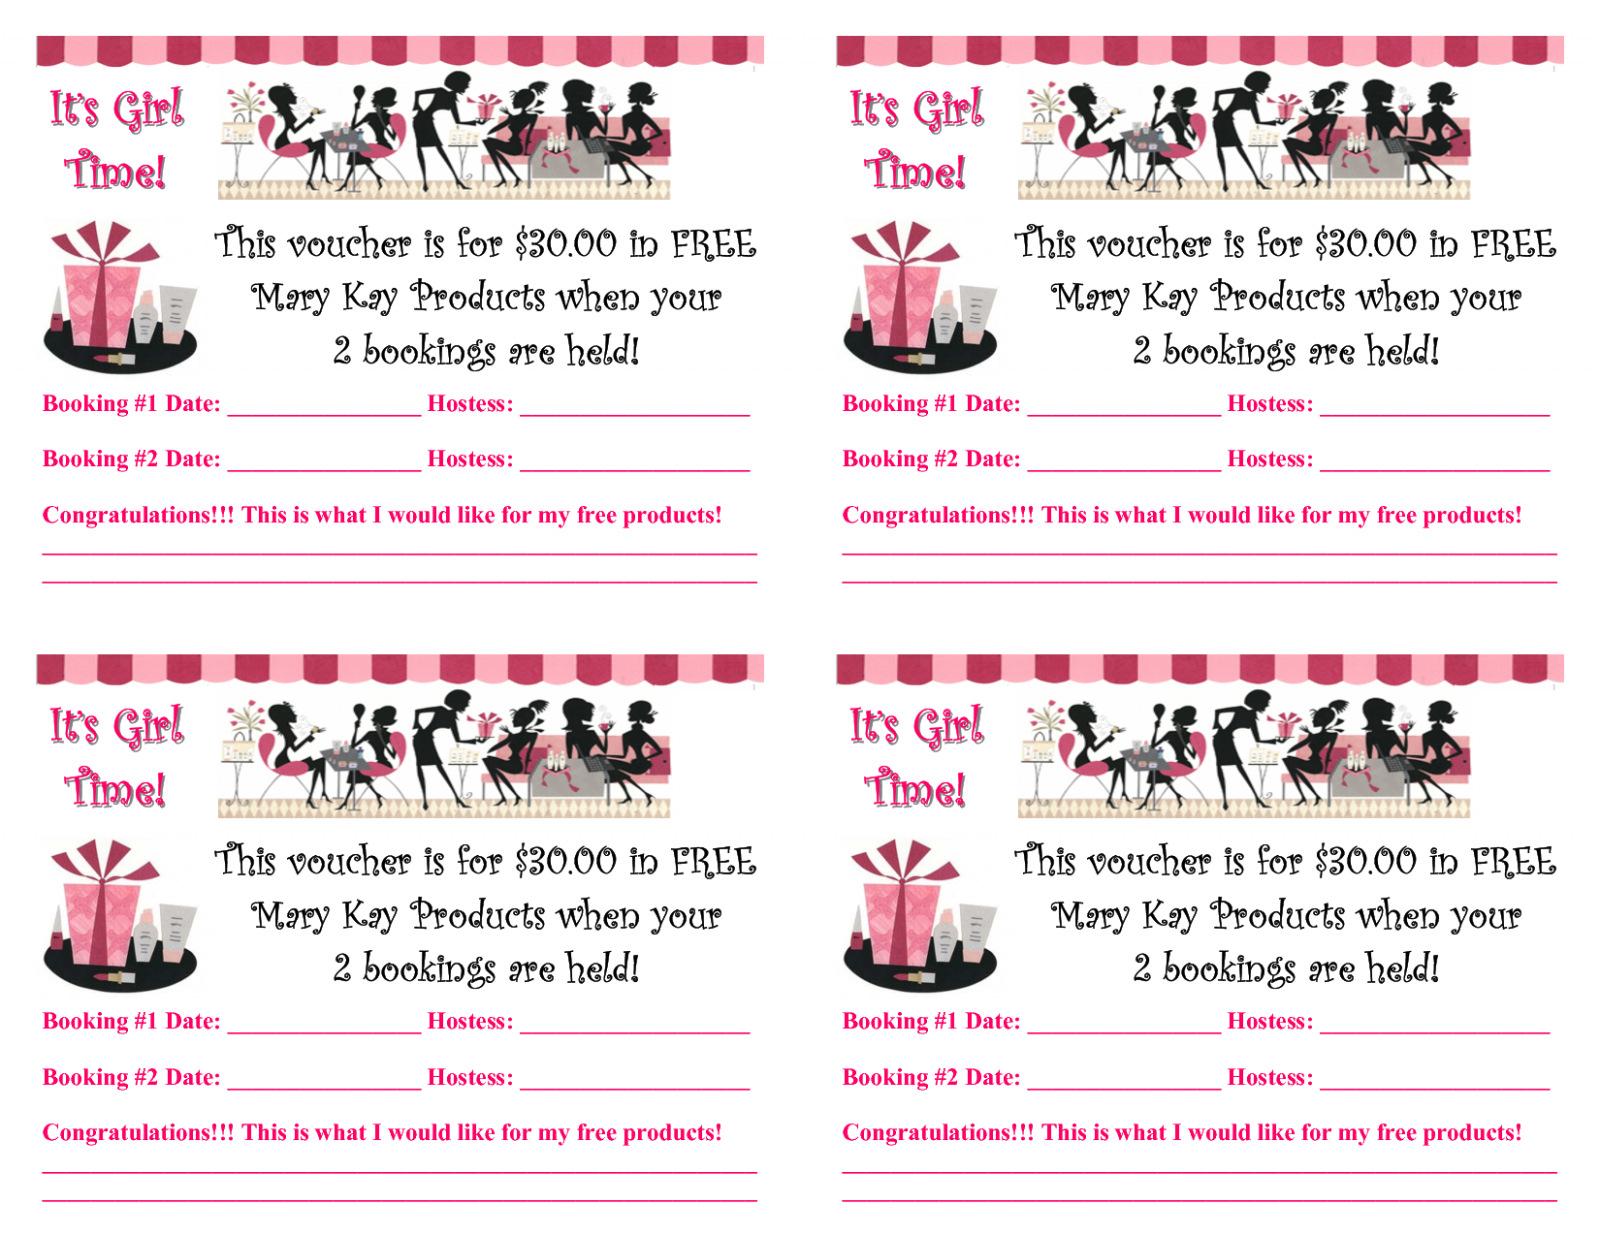 Get Mary Kay Party Invitations – Gangcraft – Freemanfrenzy - Mary Kay Invites Printable Free